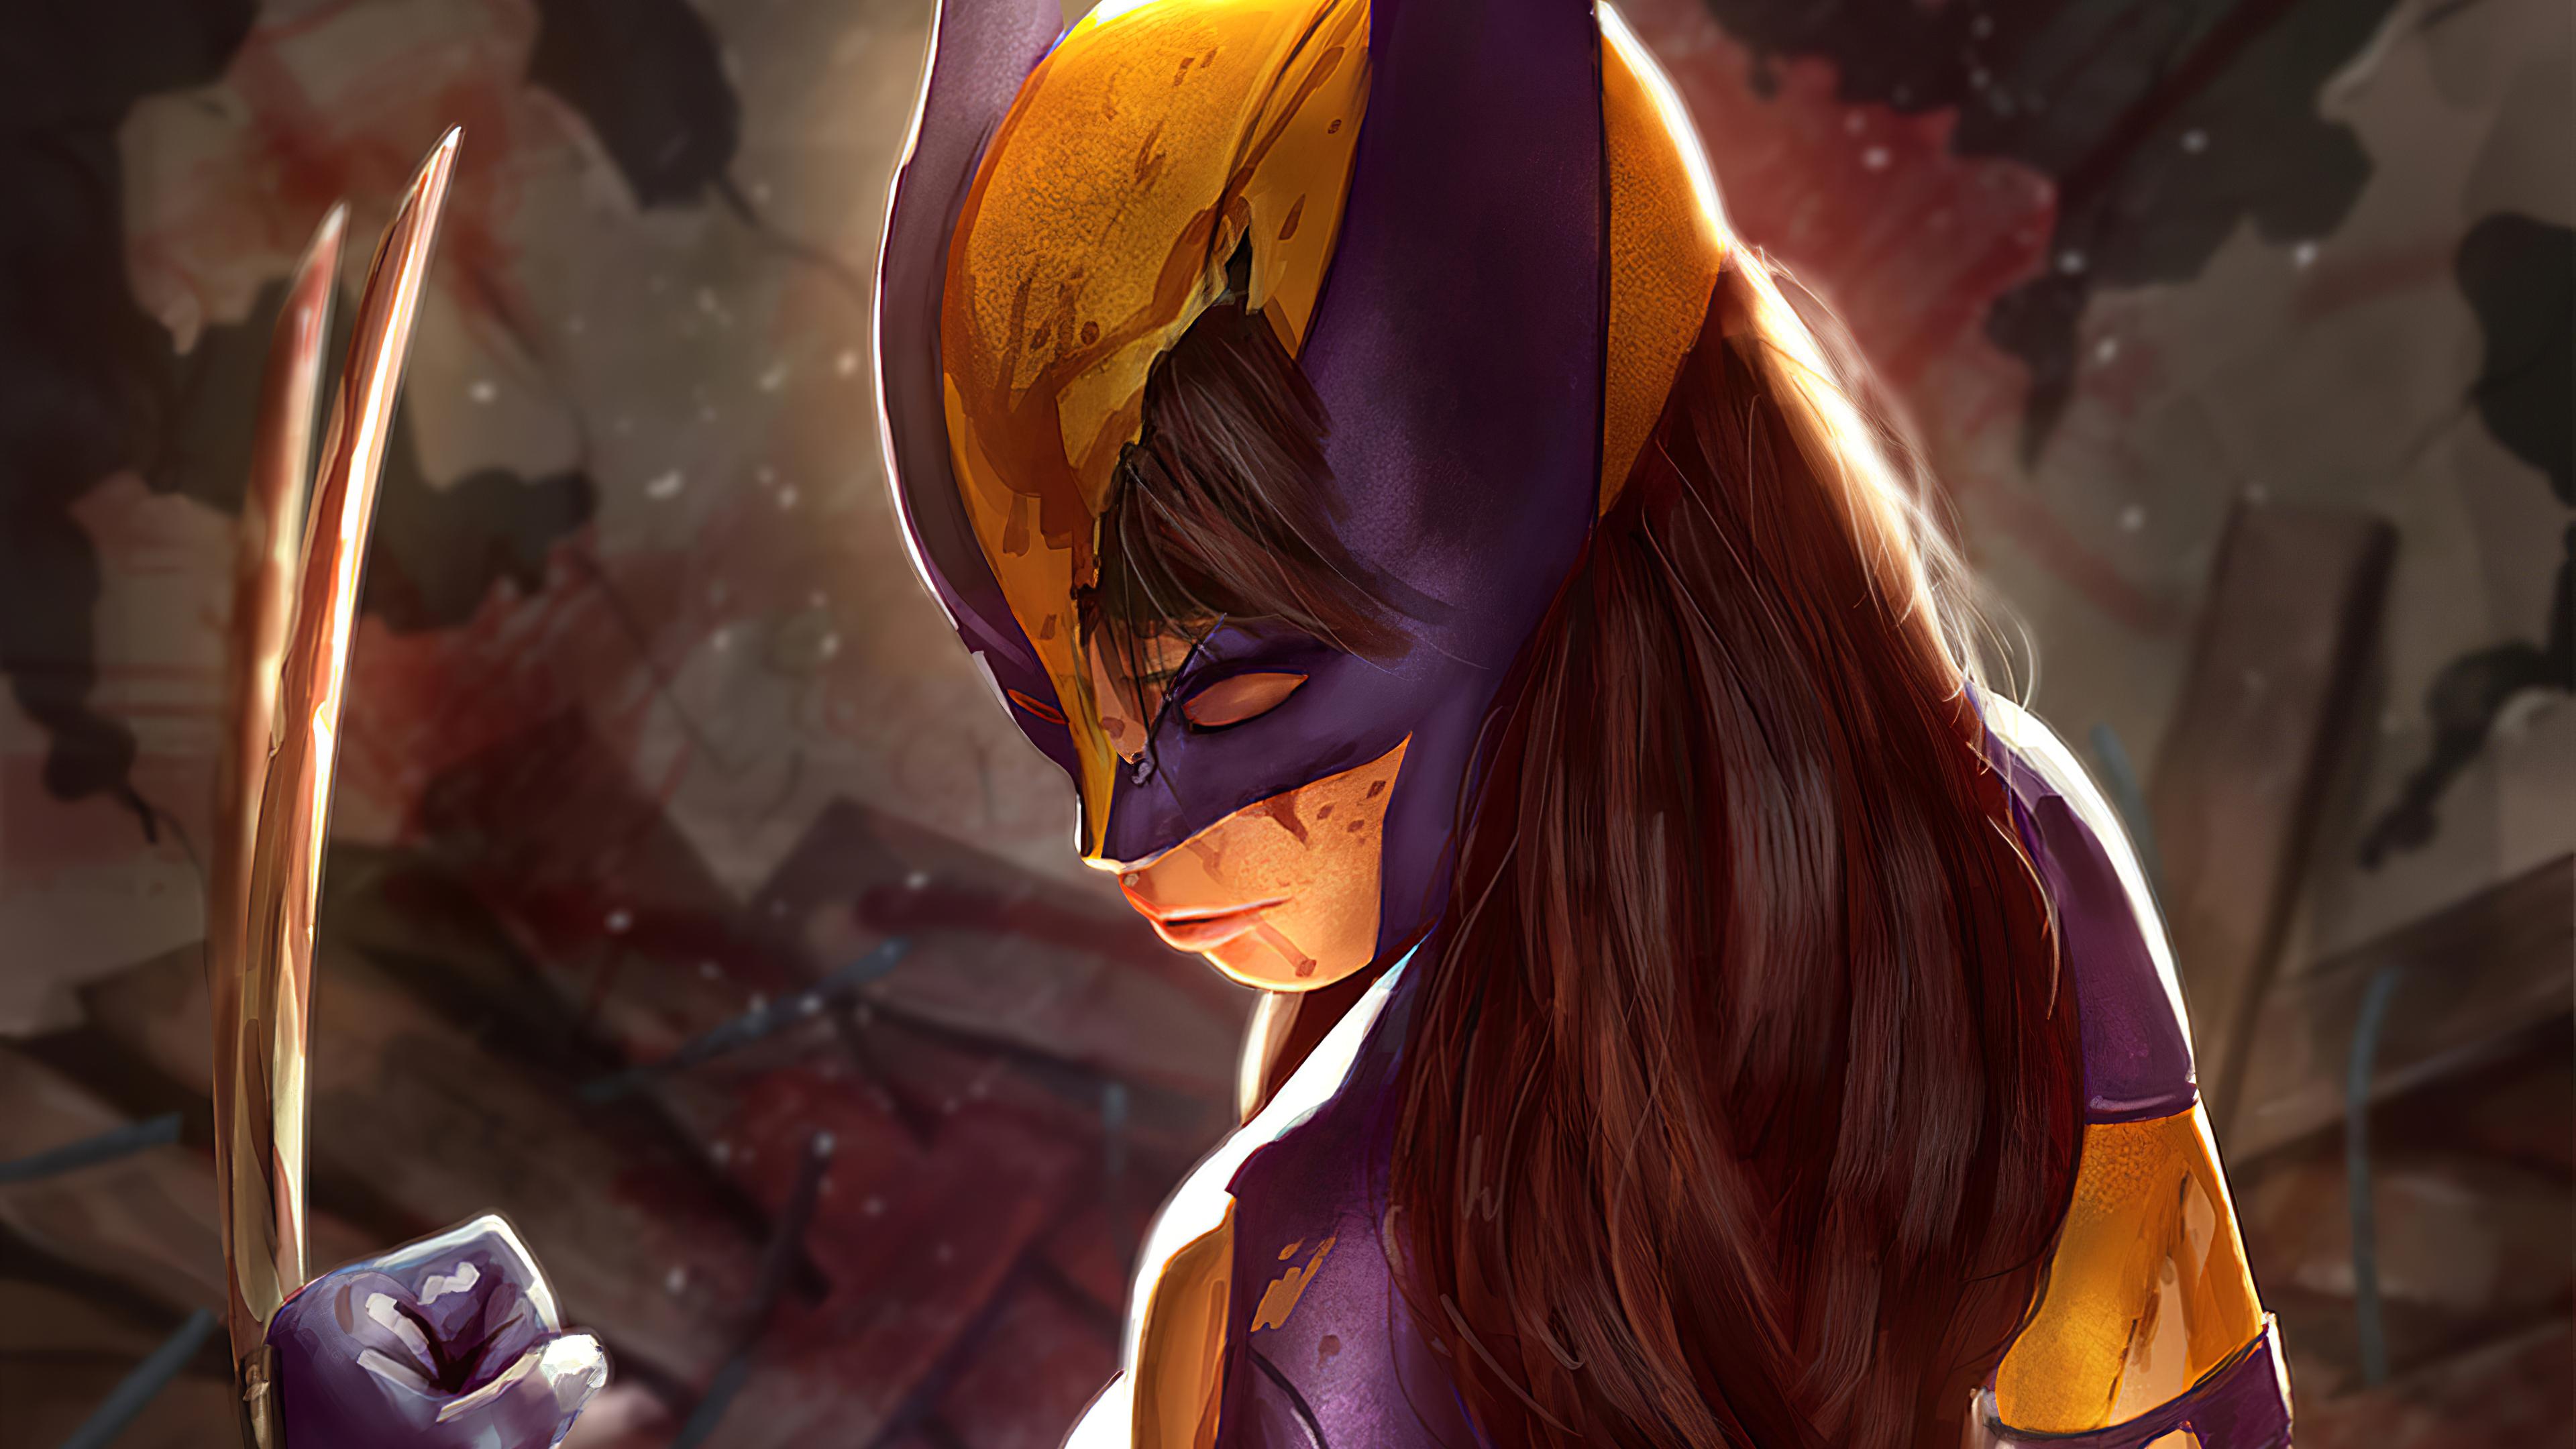 Fondos de pantalla X-23 Laura Kinney